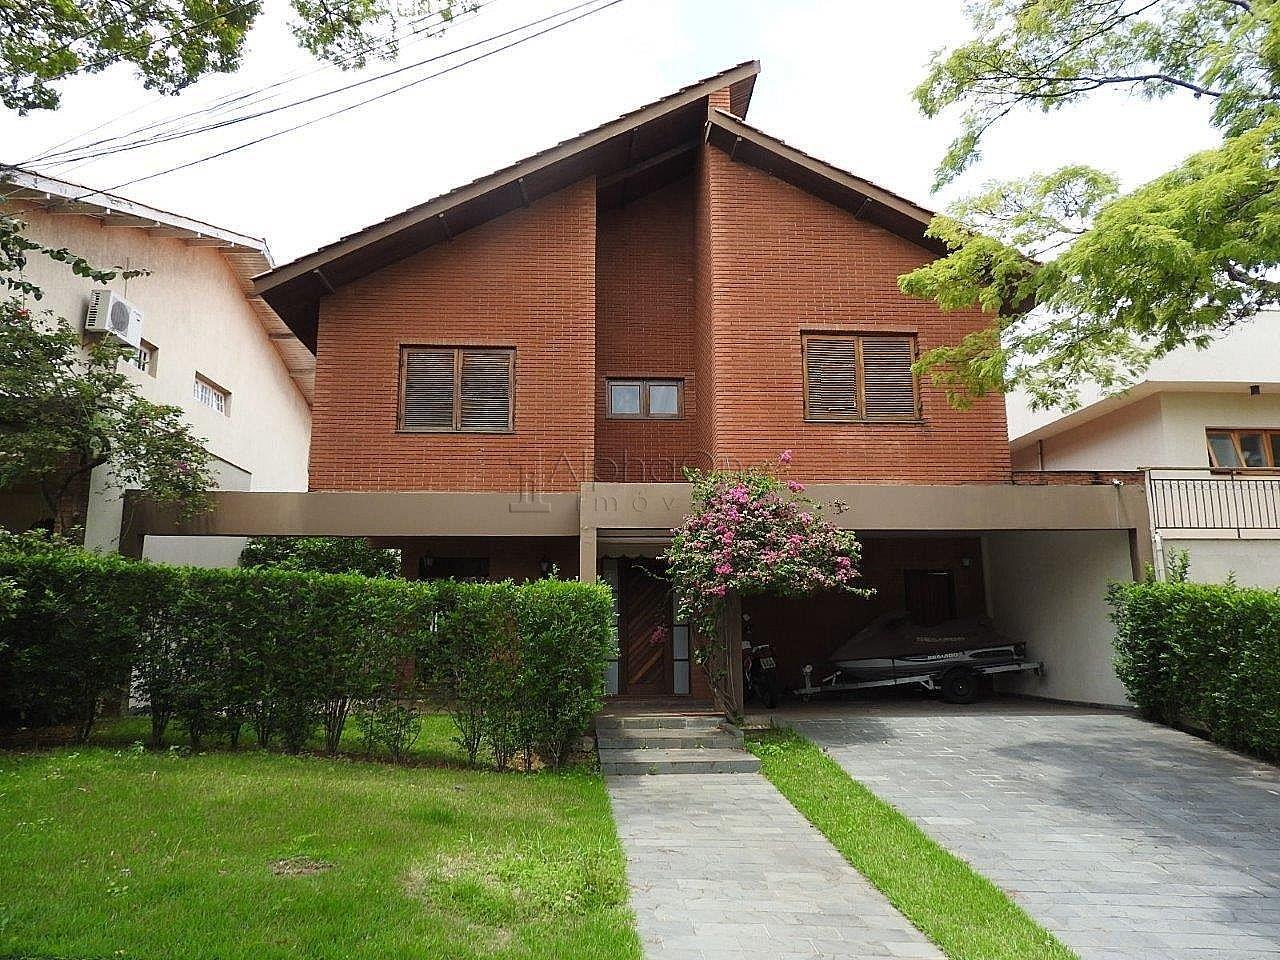 Casa em Condomínio Alphaville 05 Santana de Parnaíba